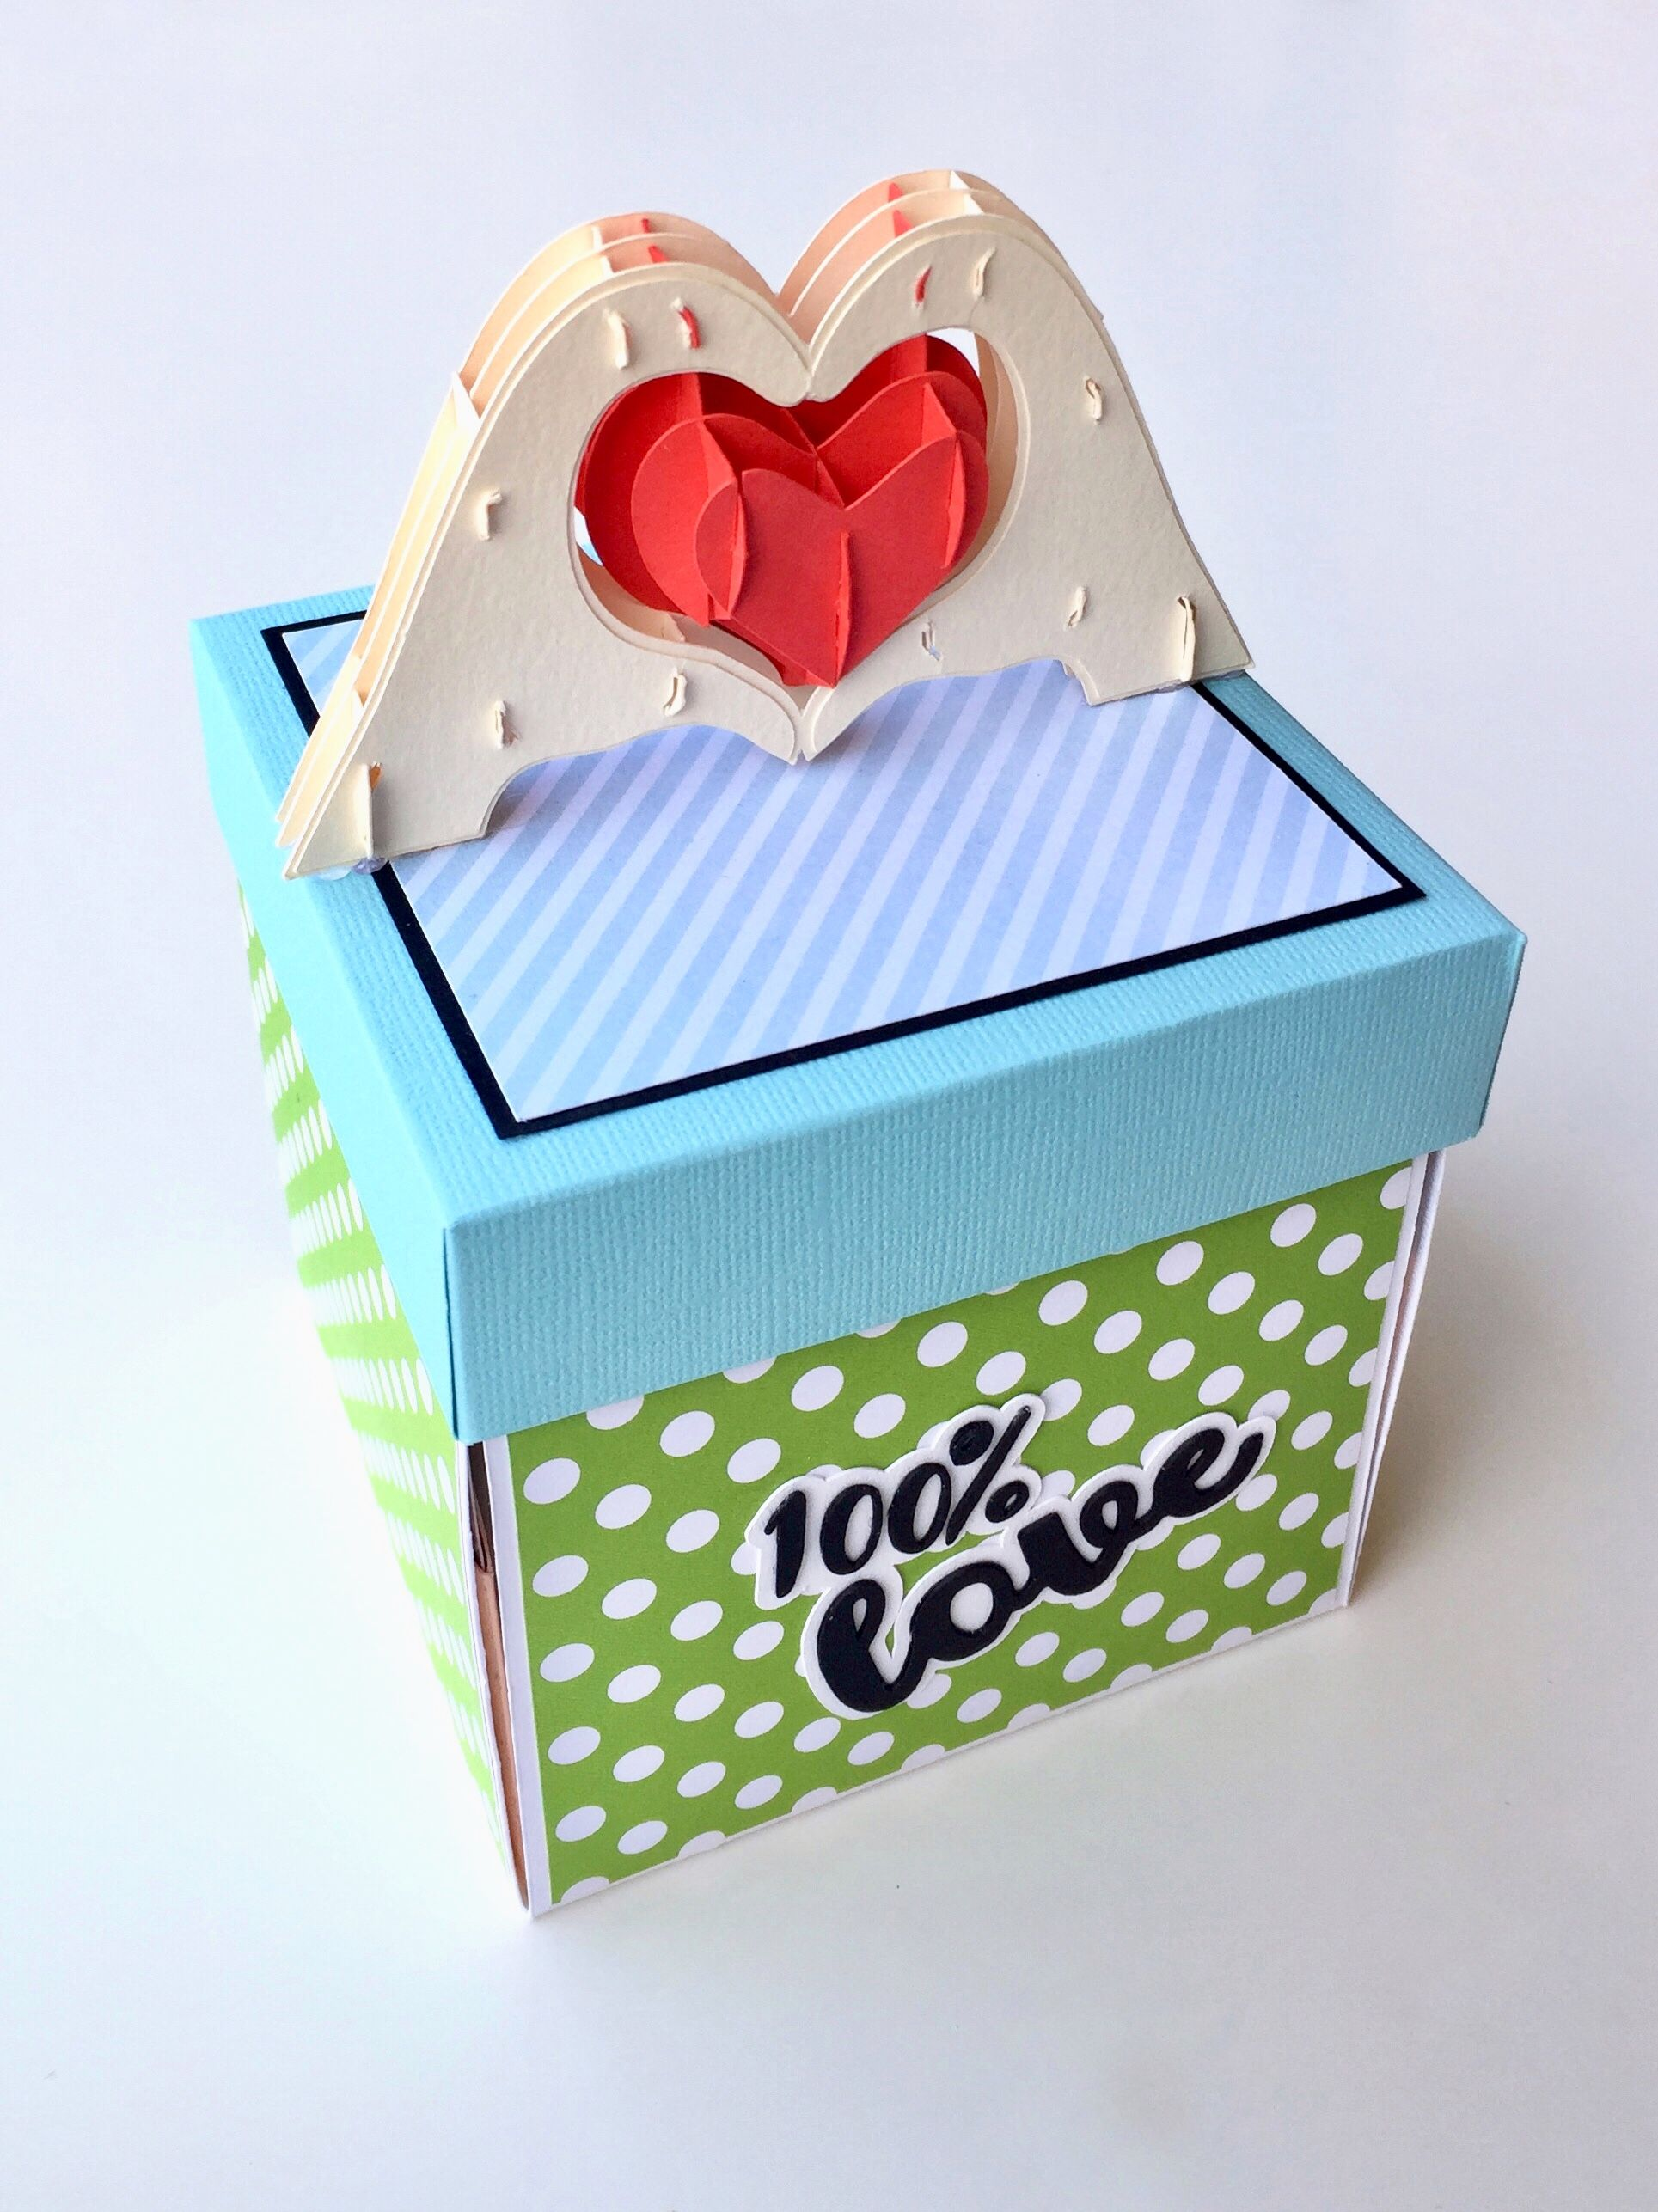 100 love explosion box by simo scrapper box pinterest box 100 love explosion box by simo scrapper thecheapjerseys Choice Image